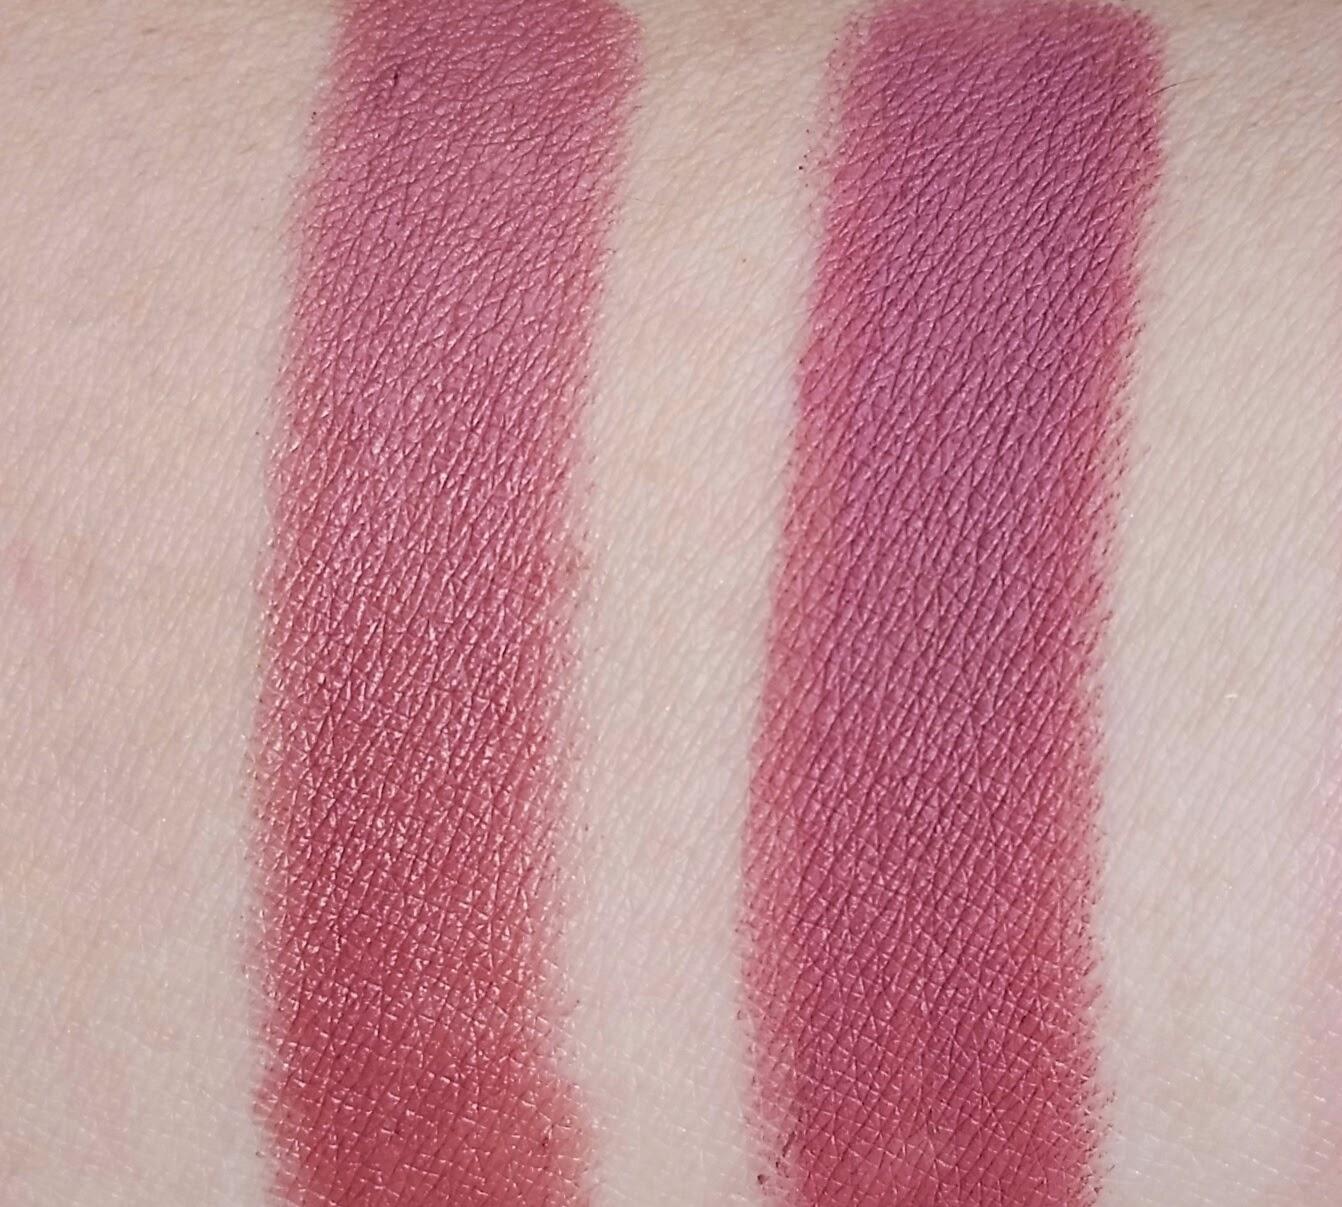 4faca99e7b8 Left: Covergirl Jumbo Gloss Balm Cream in Berries 'n Cream Right: Colourpop  Lippie Stix in Lumiere